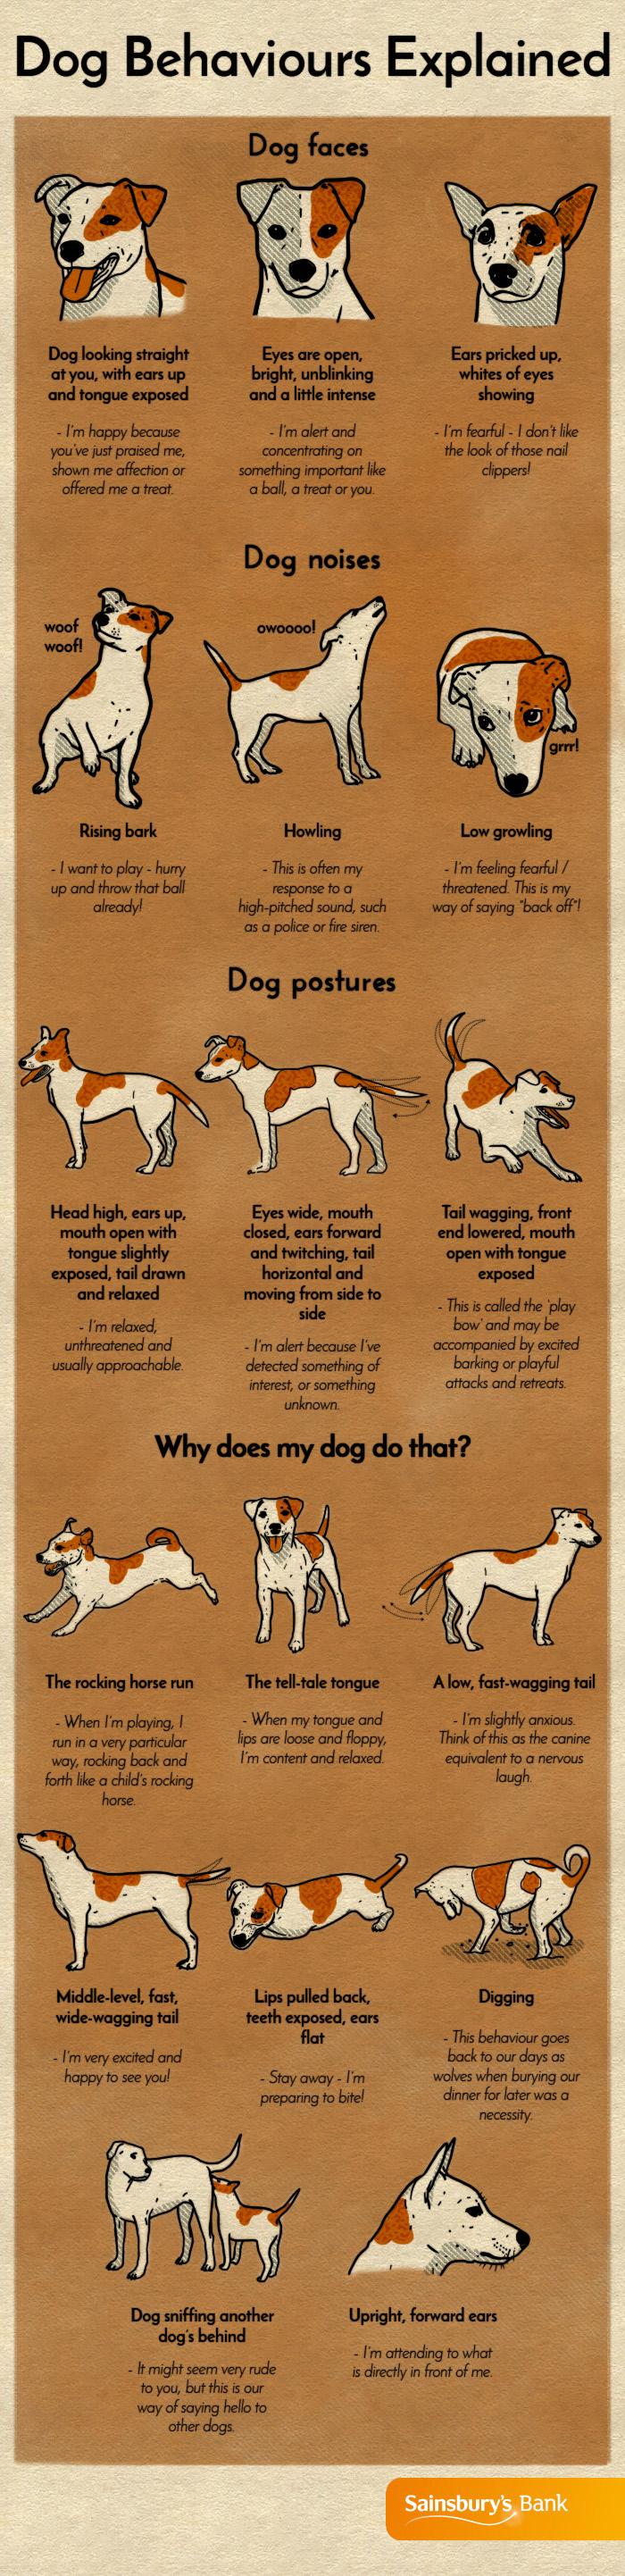 dog-behaviours